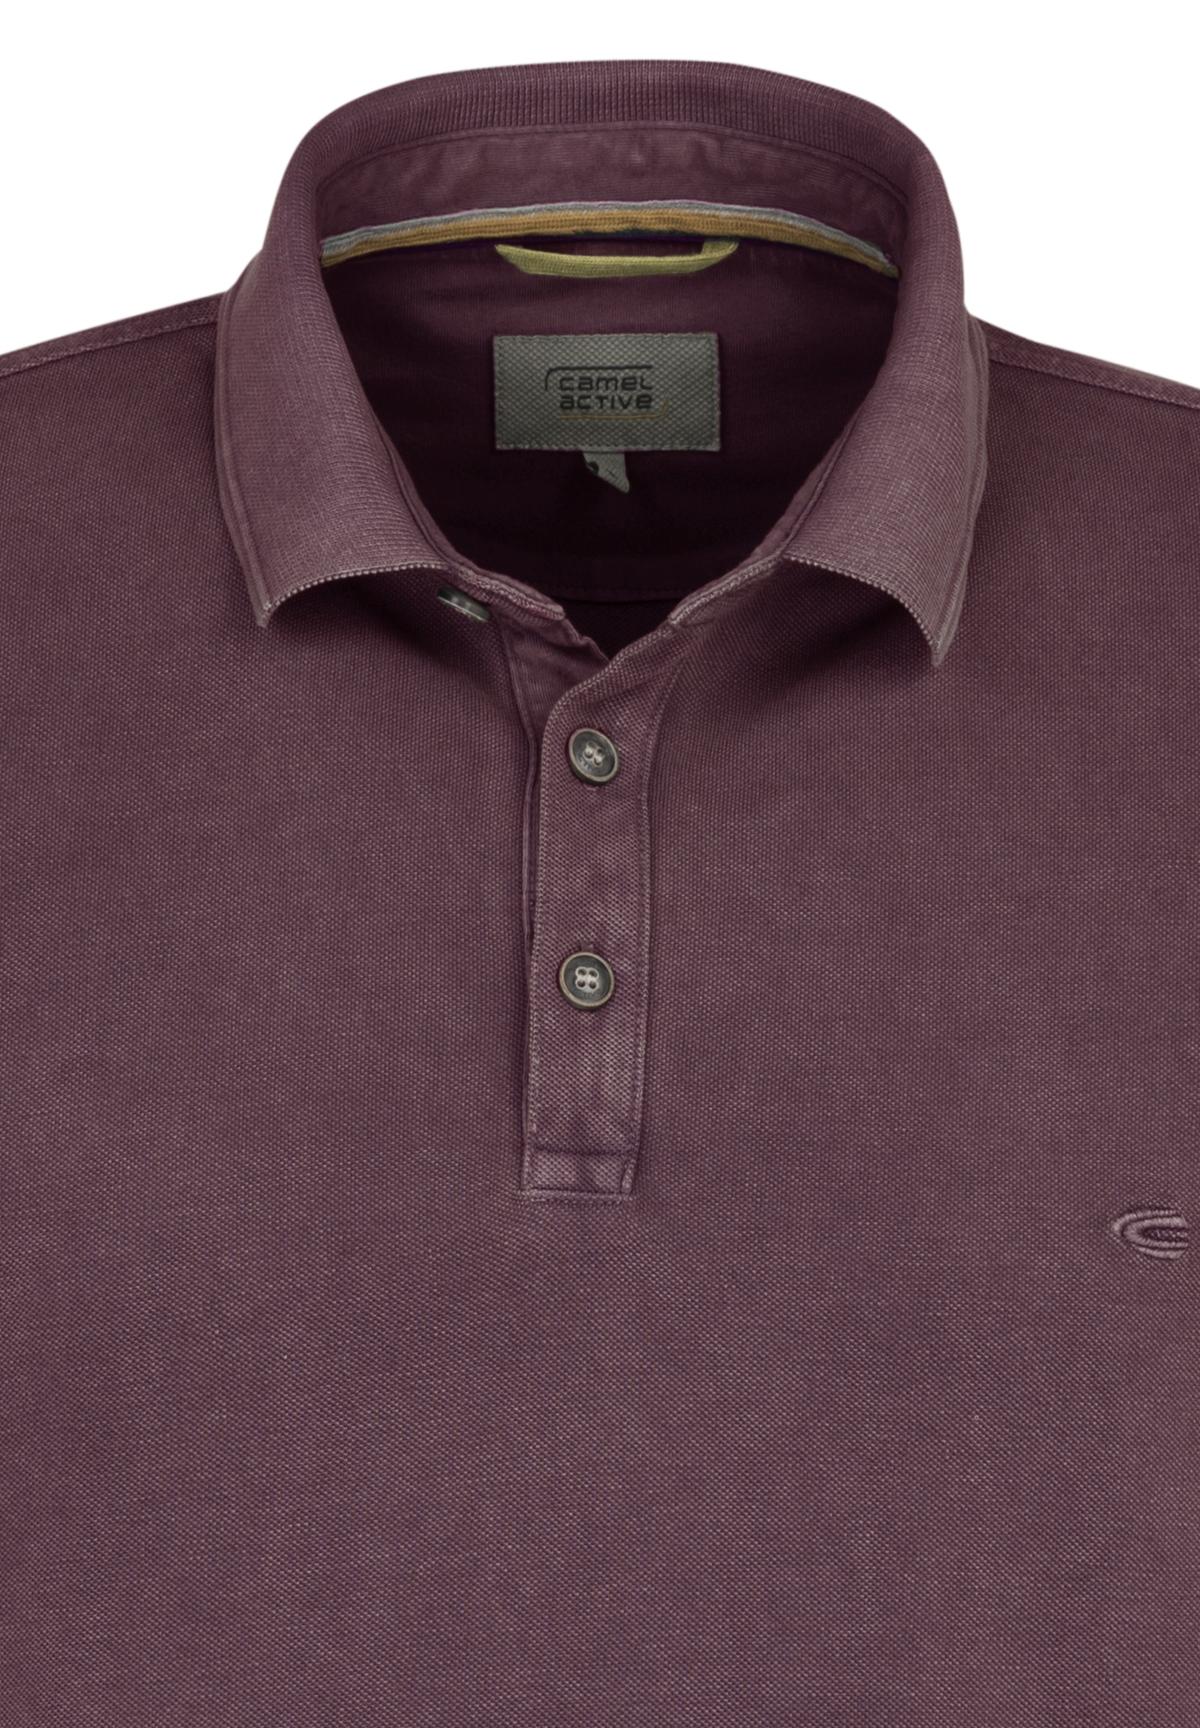 Camel-Active-Herren-Shirt-Poloshirt-Pique-Regular-Fit-NEU Indexbild 95